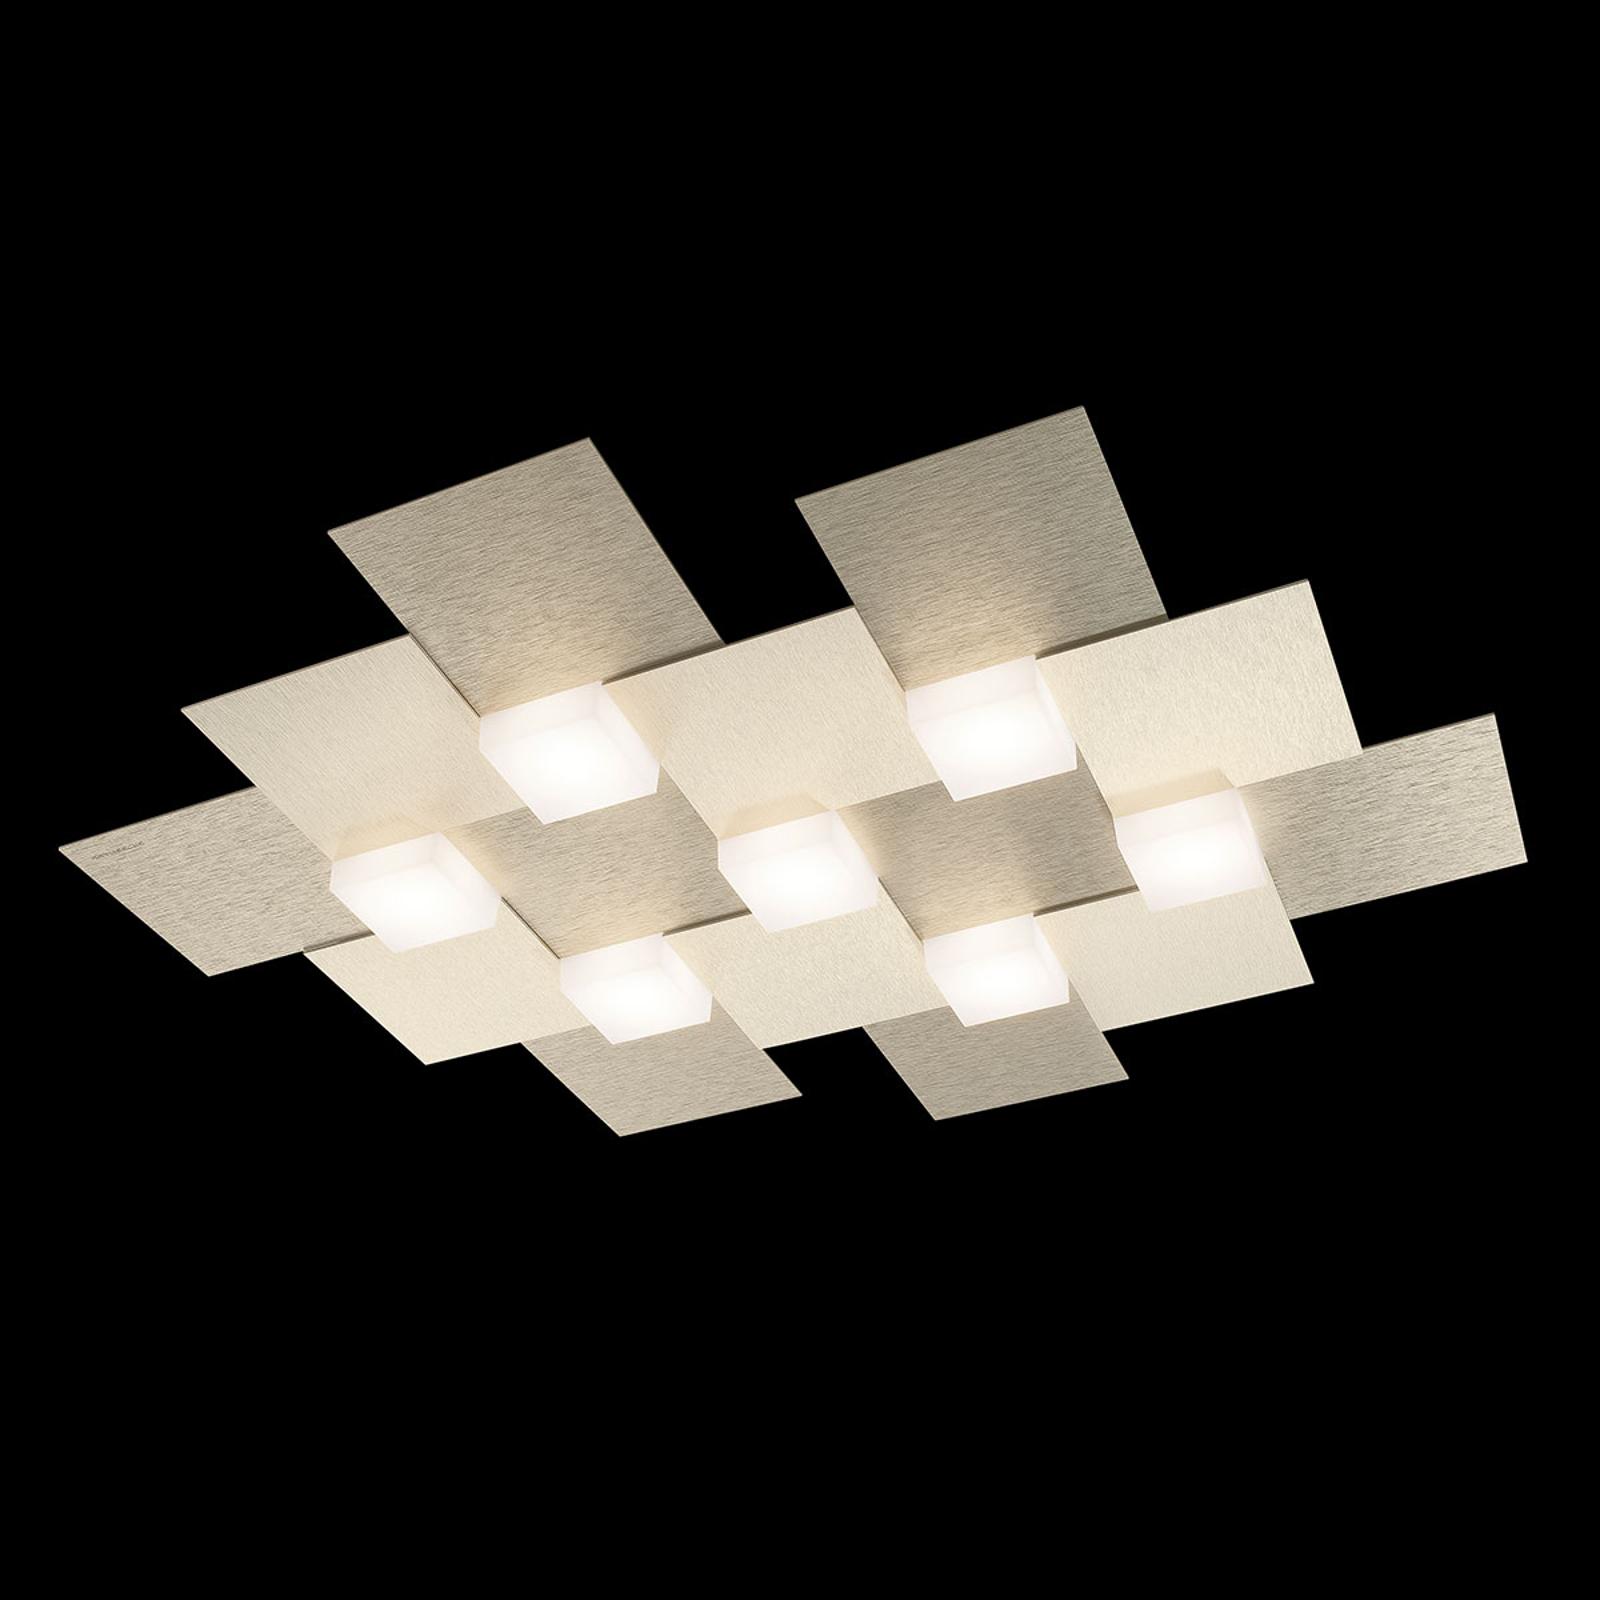 GROSSMANN Creo lampa sufitowa LED 7-pkt szampańska